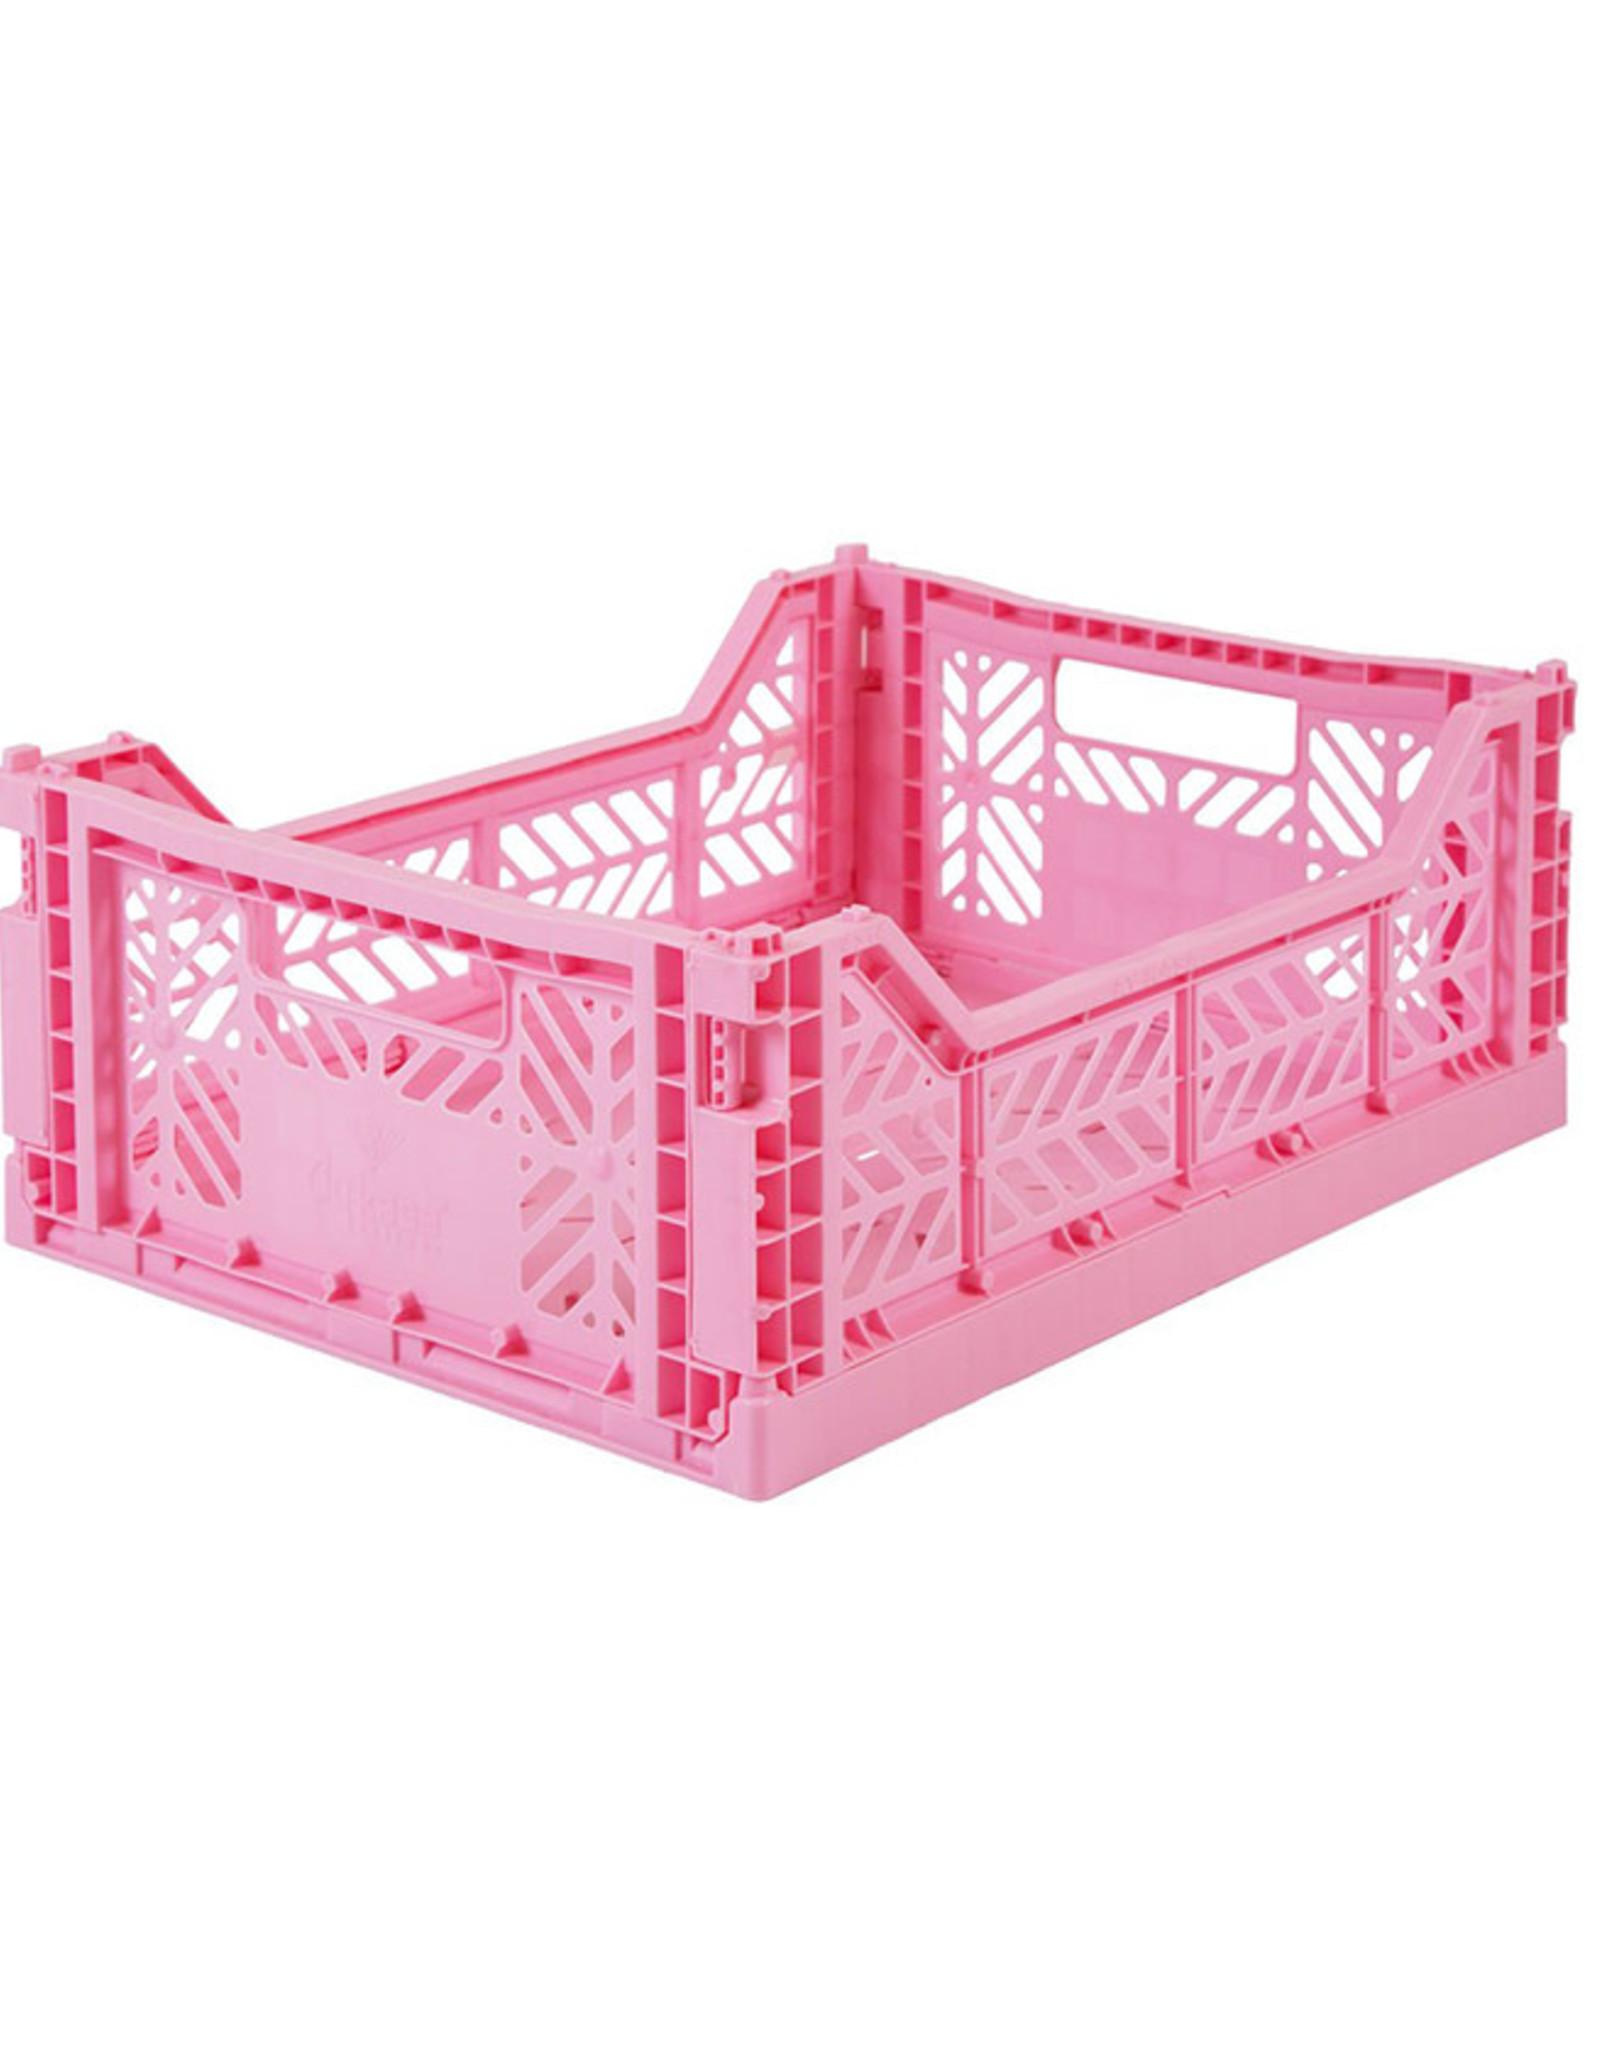 Aykasa Aykasa Plooibox Midi-baby pink